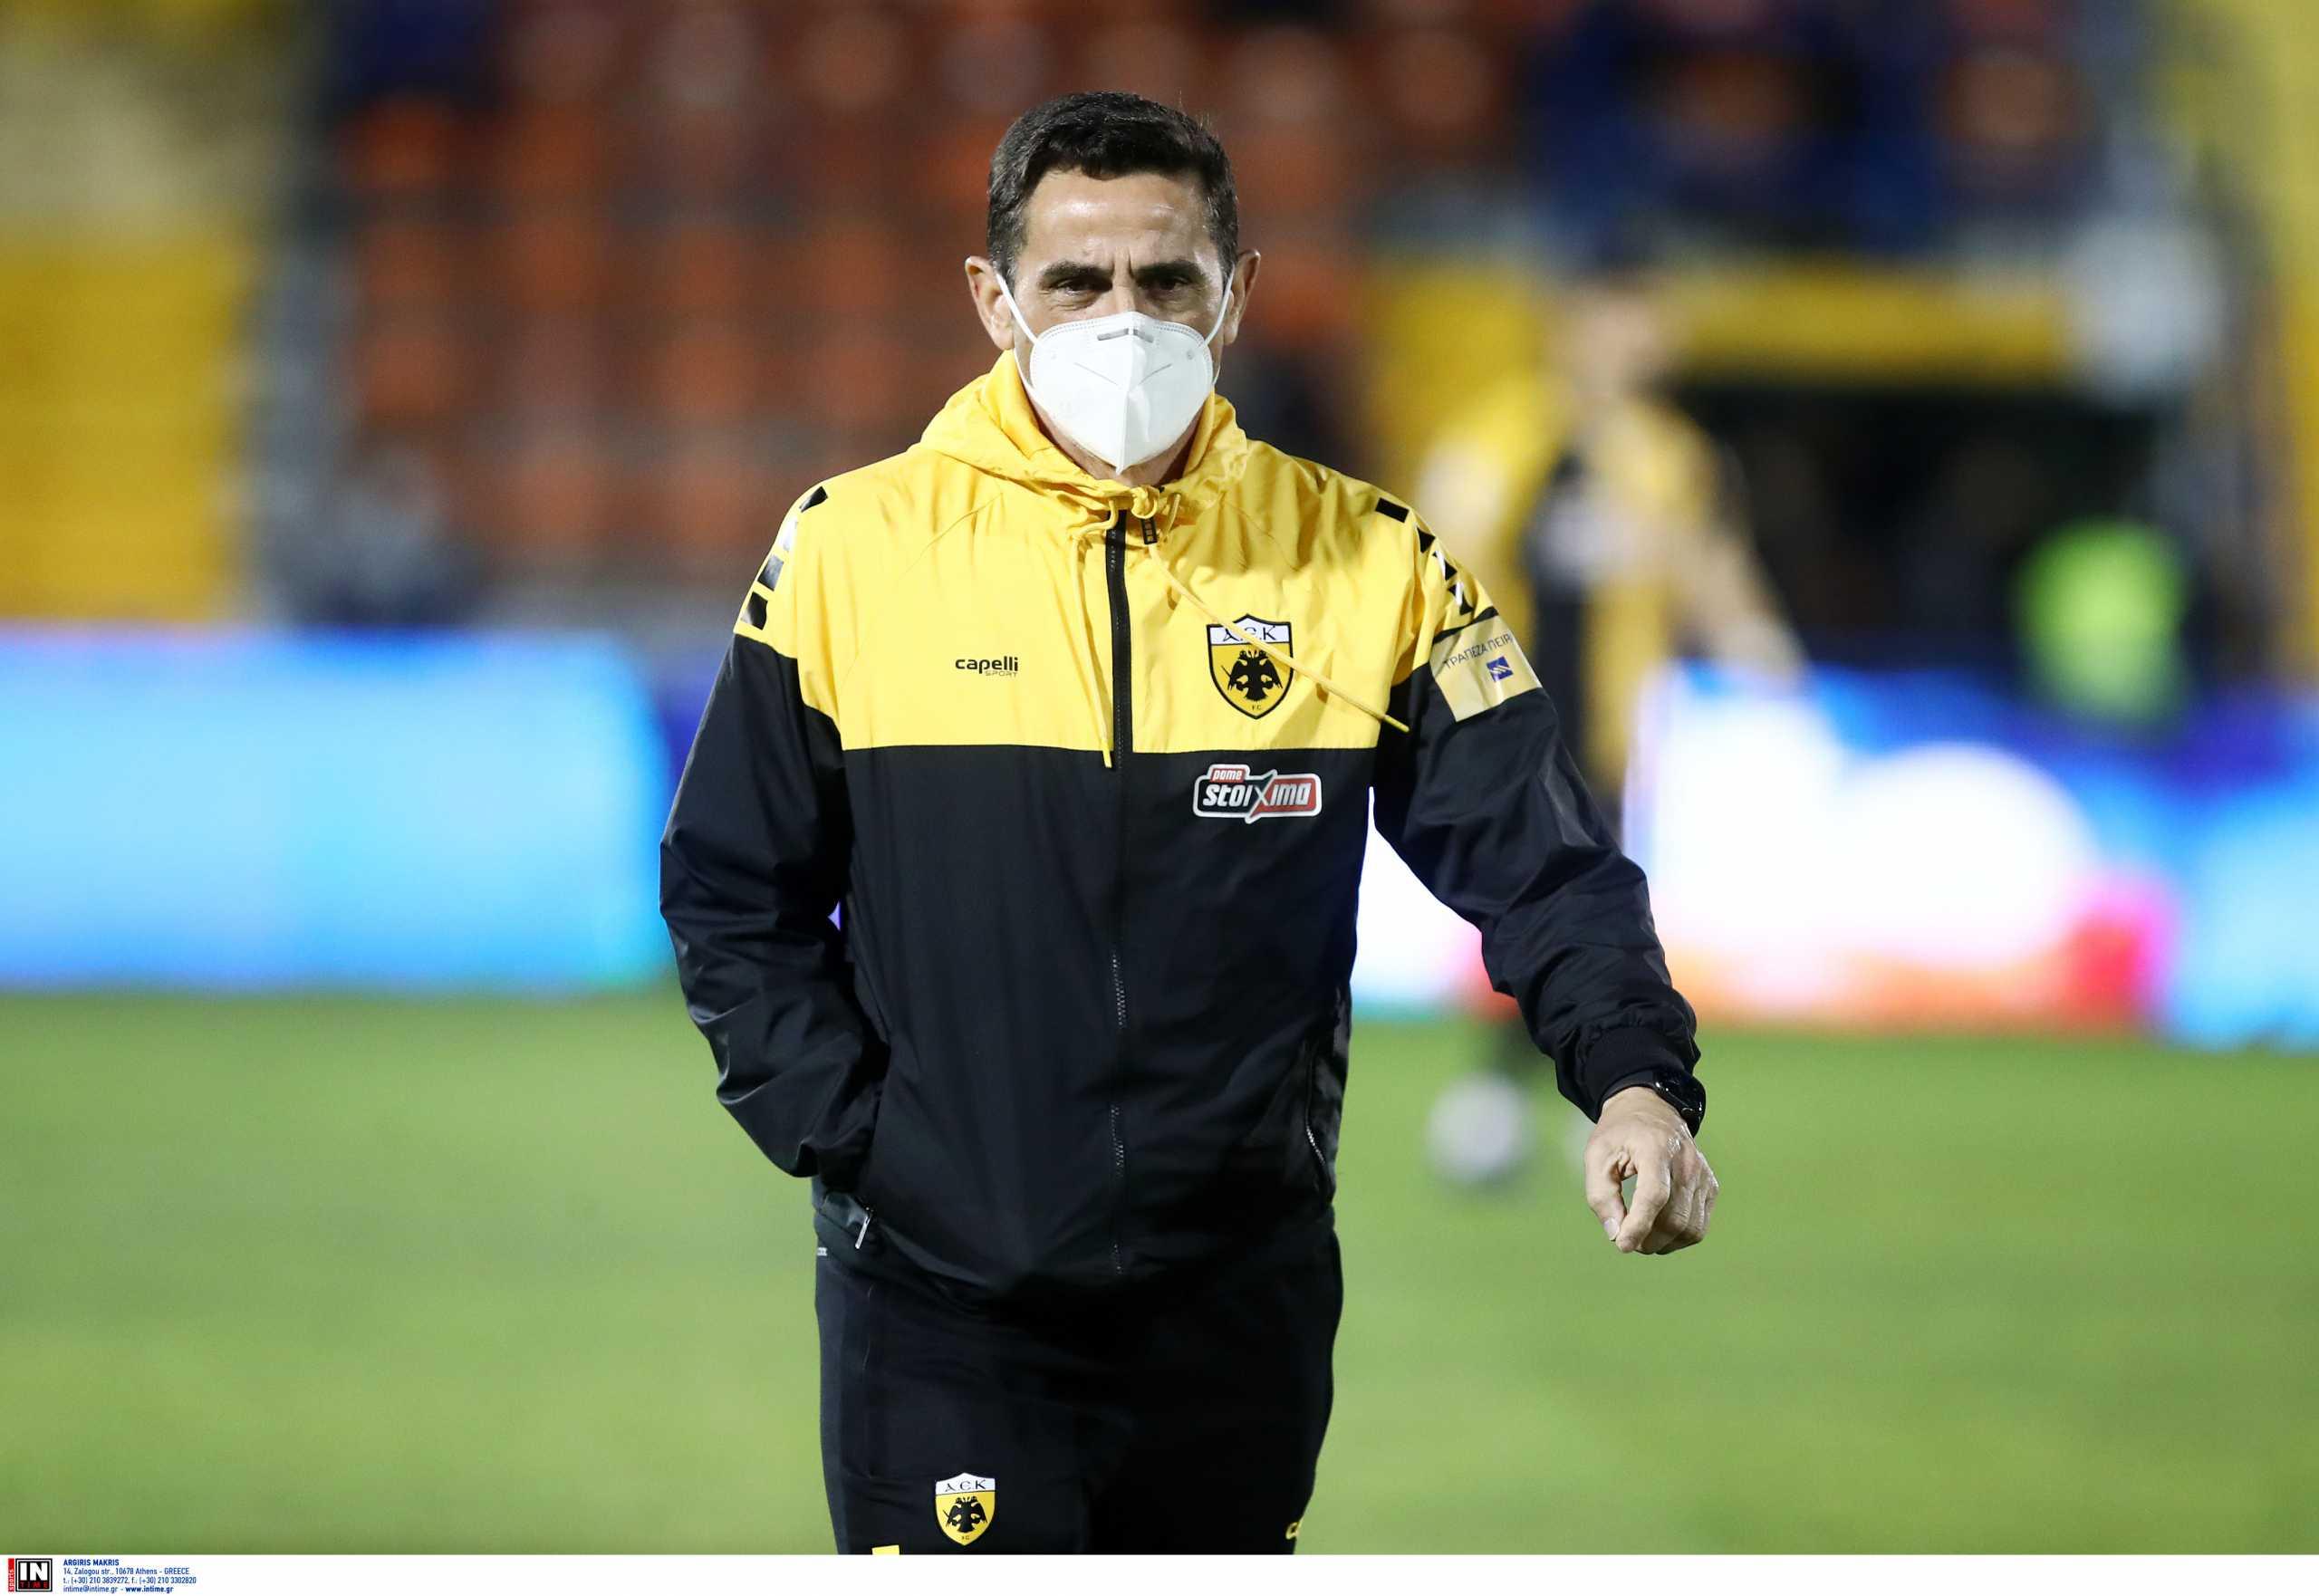 AEK: Έξαλλος ο Χιμένεθ – «Είμαι πολύ θυμωμένος με το πρώτο μέρος» (video)